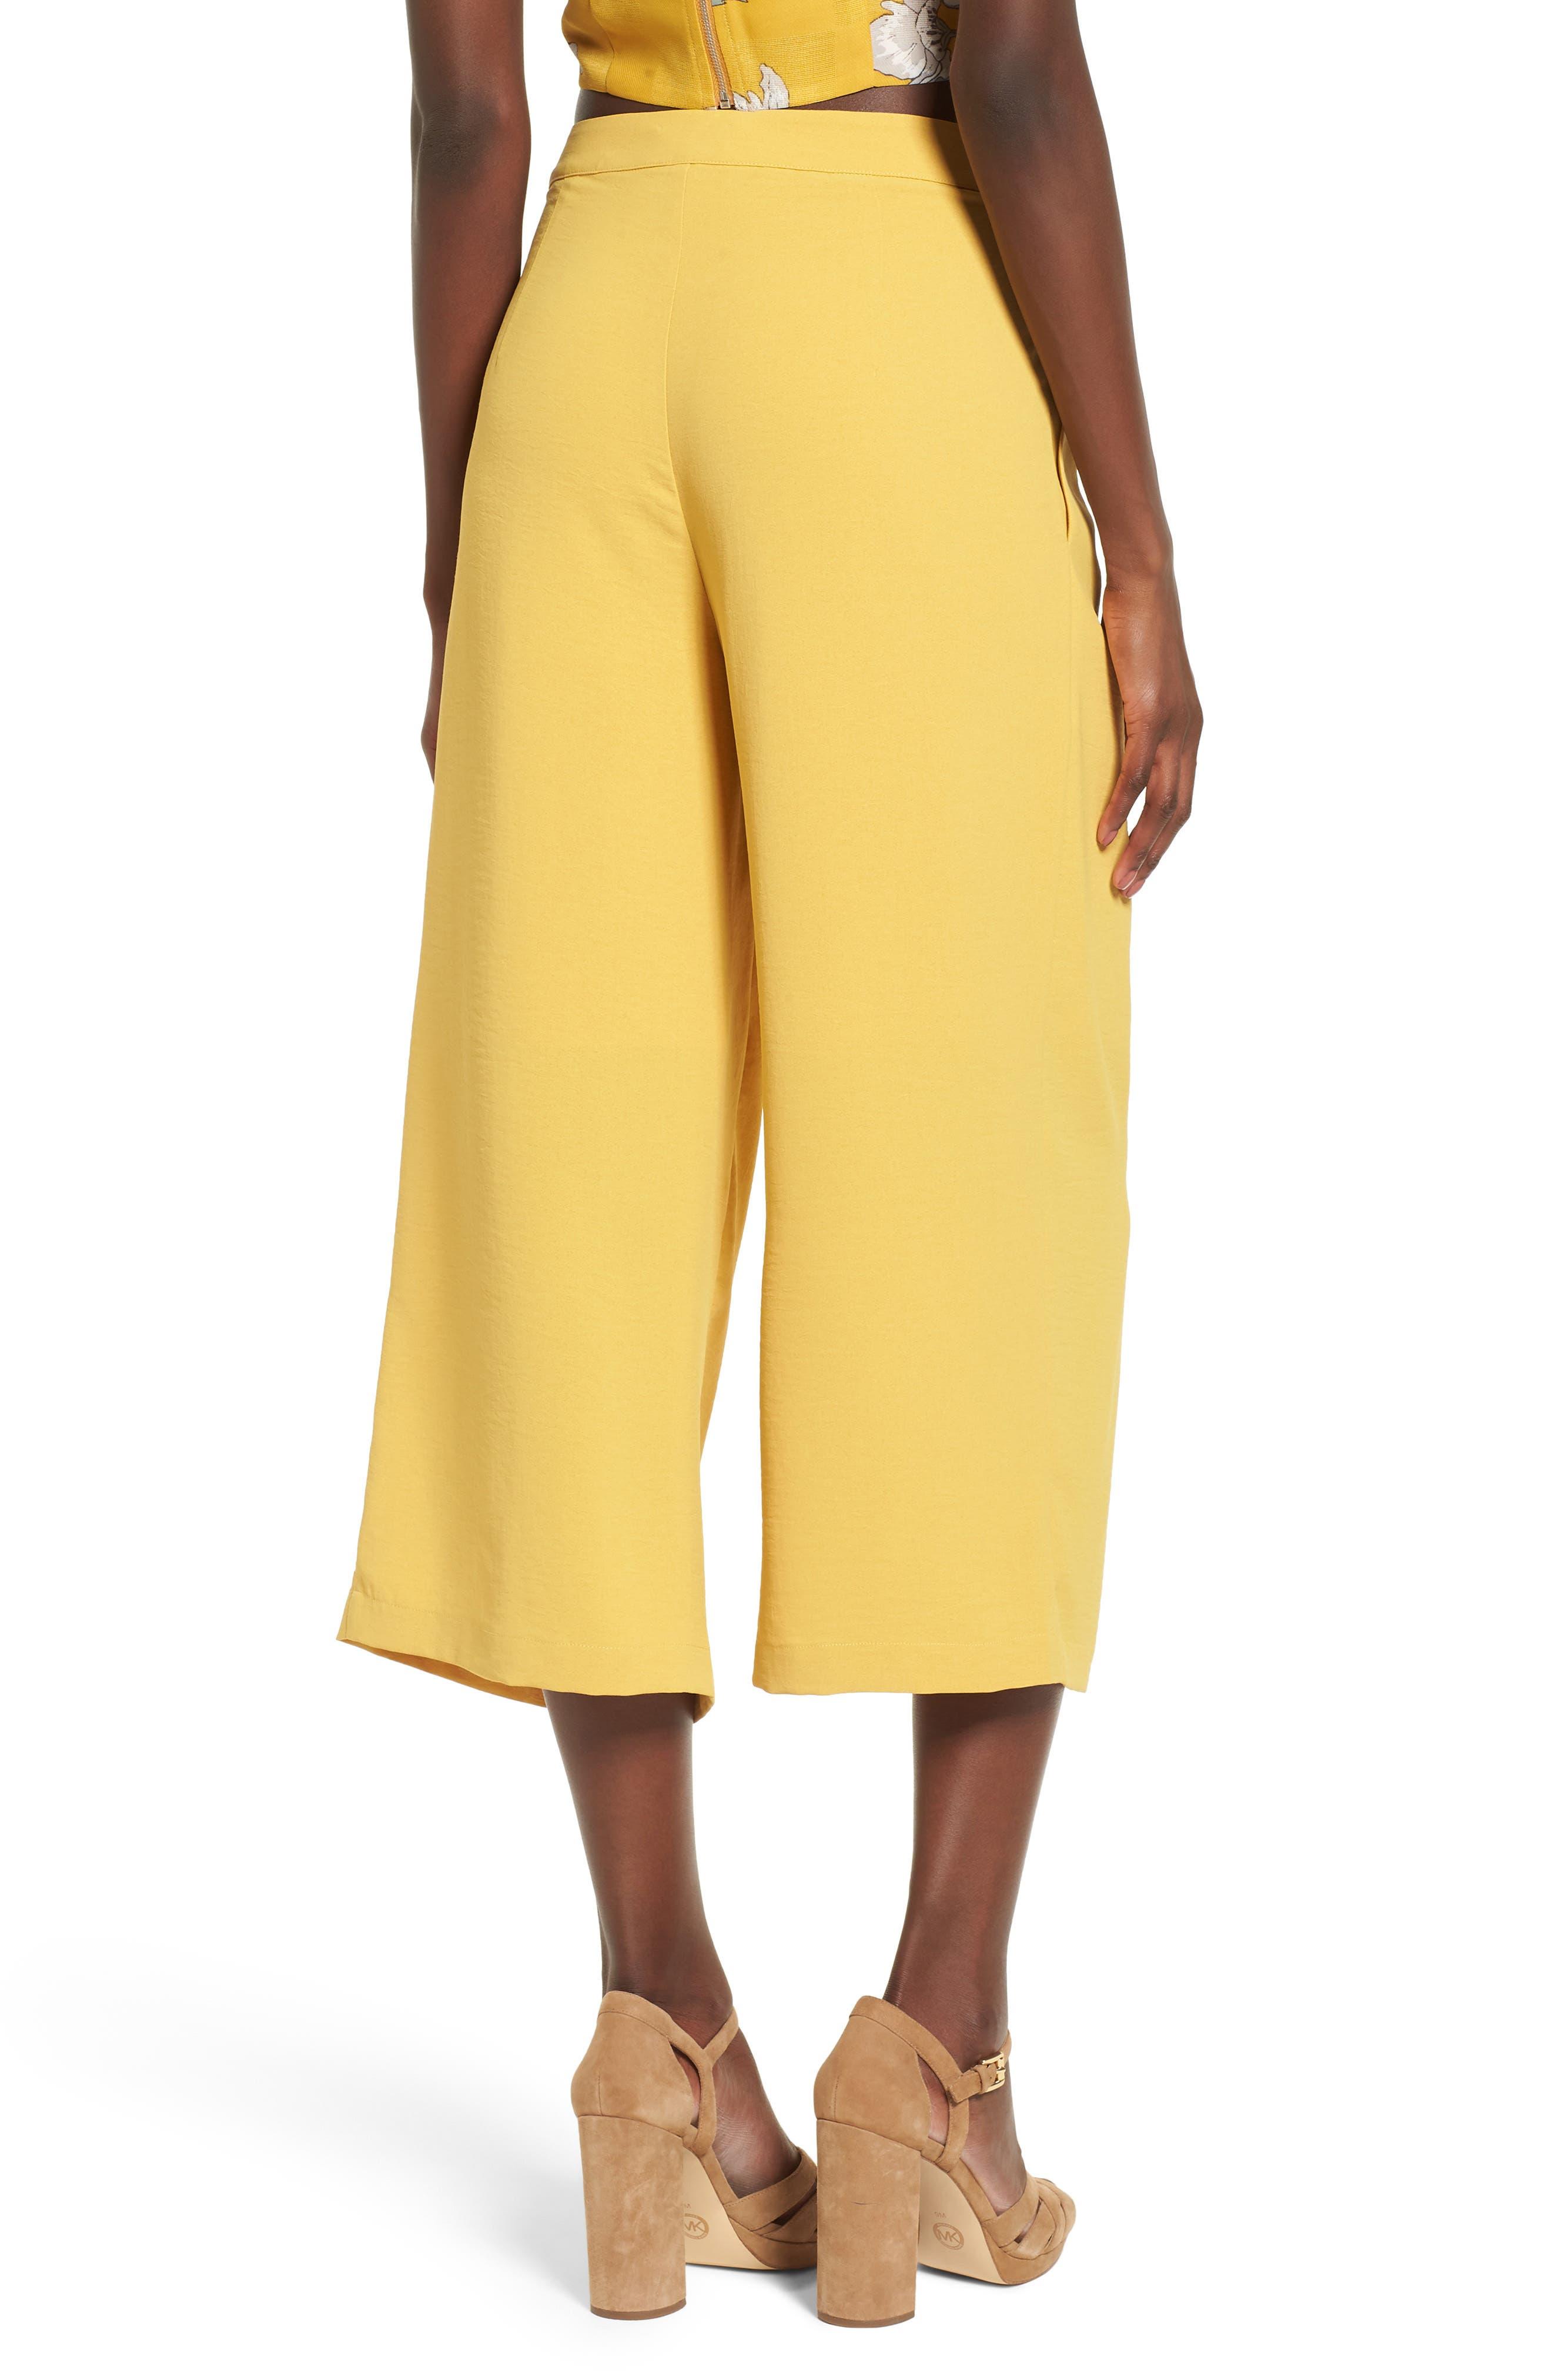 Chriselle x J.O.A. Pleat High Waist Crop Wide Leg Pants,                             Alternate thumbnail 4, color,                             Roman Gold